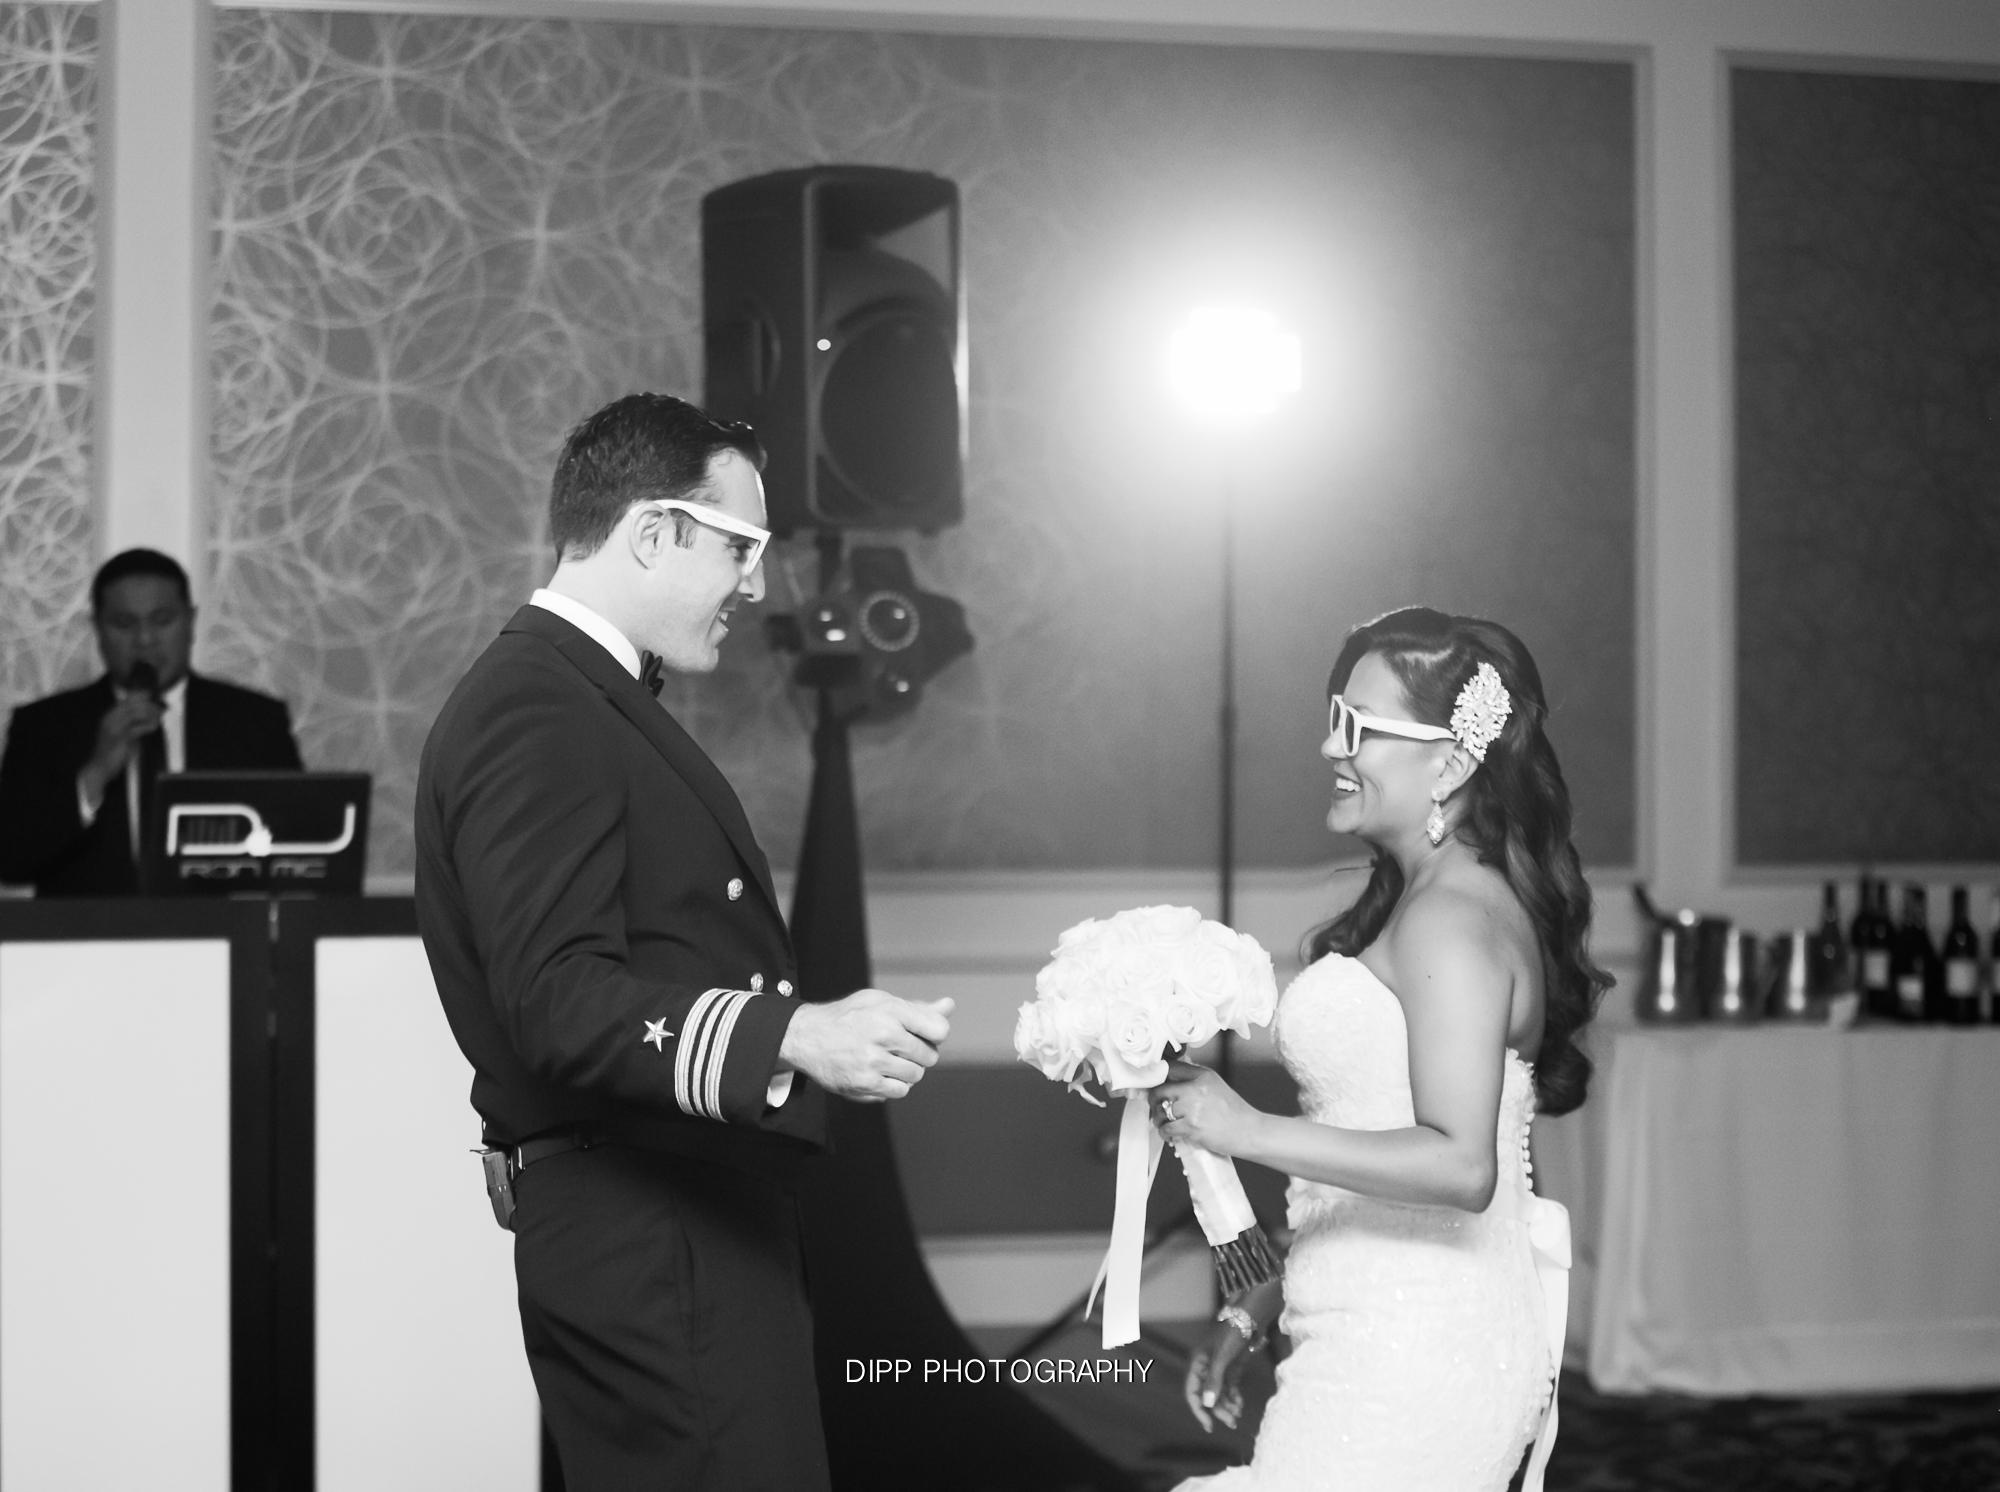 Dipp_2016 EDITED Sara & Brandon Wedding-419